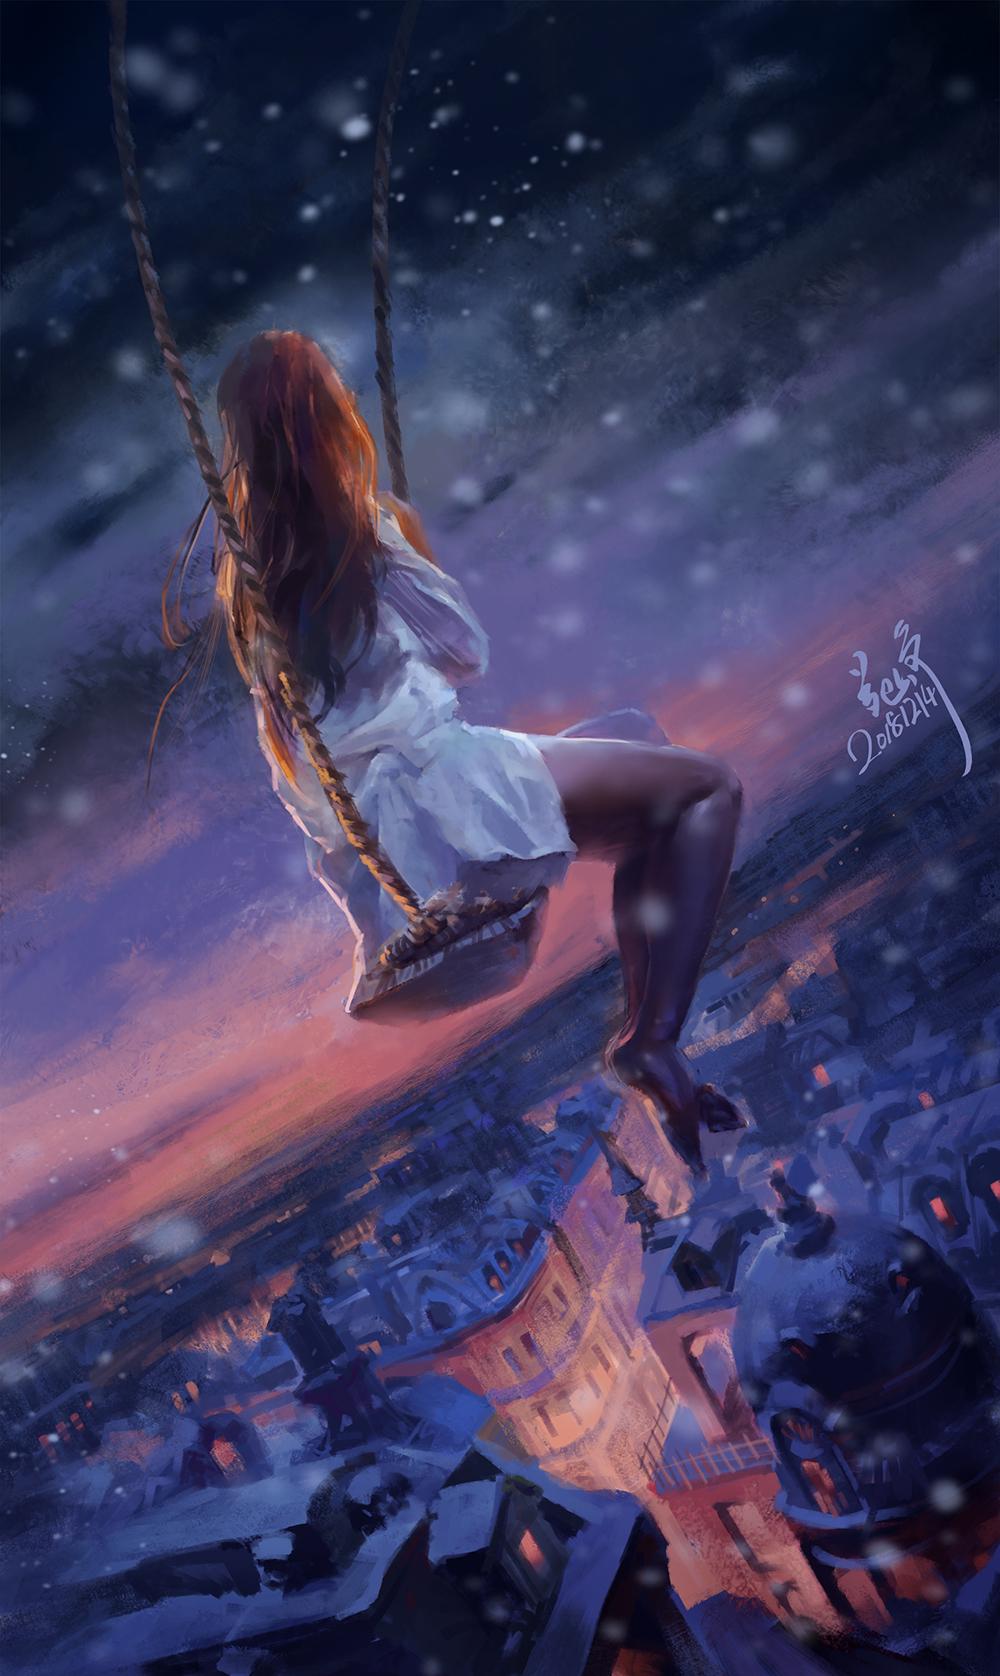 Zen ryan swing dream 1 7ae74299 nl9s